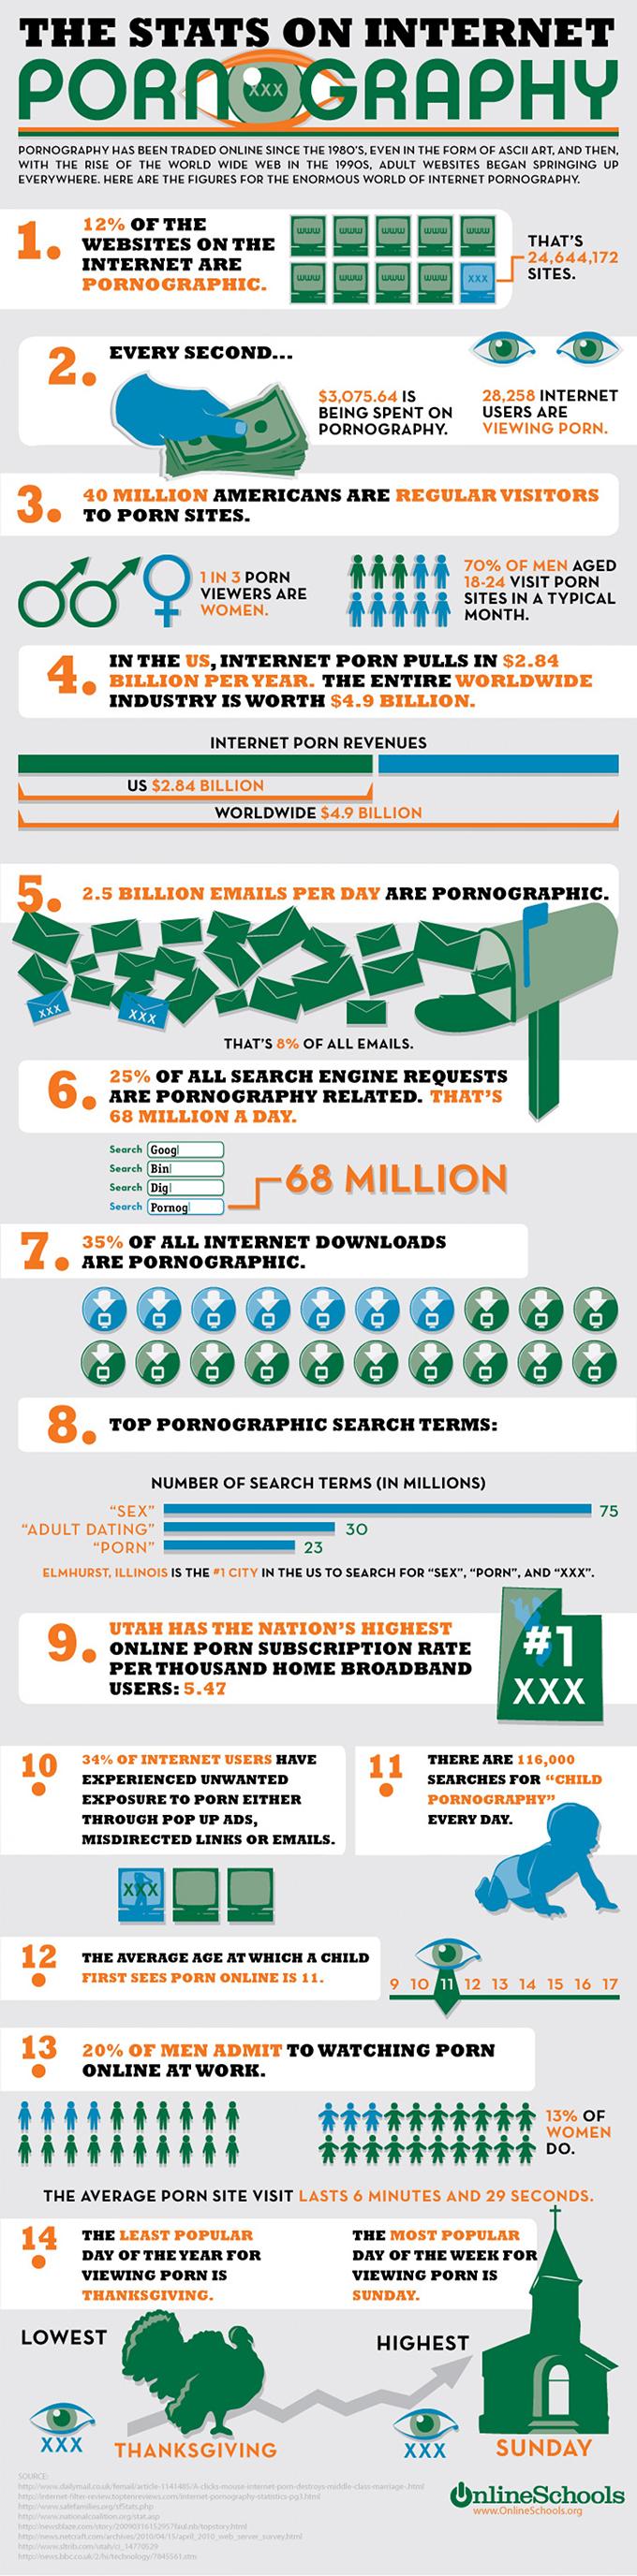 internet-porn-statistics-infographic